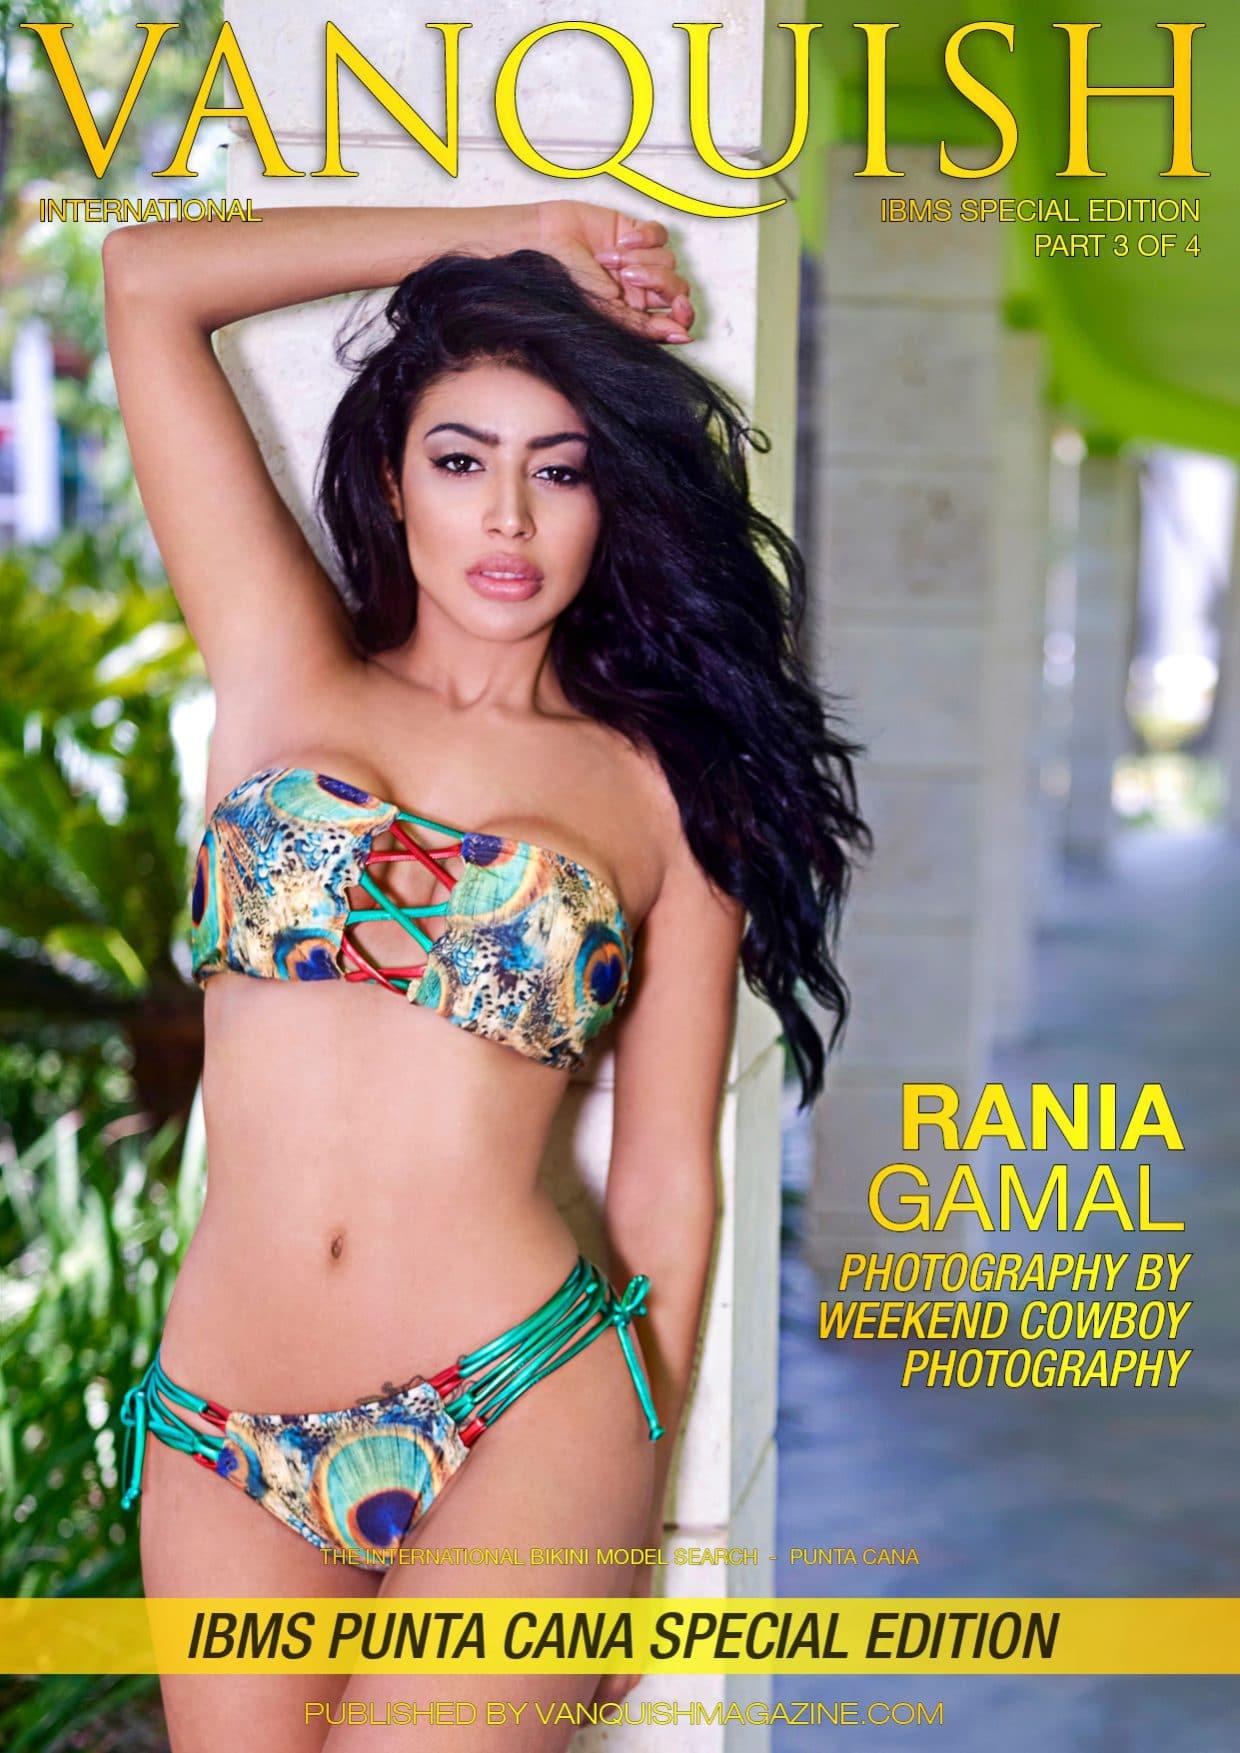 Vanquish Magazine - IBMS Punta Cana - Part 3 - Rania Gamal 1